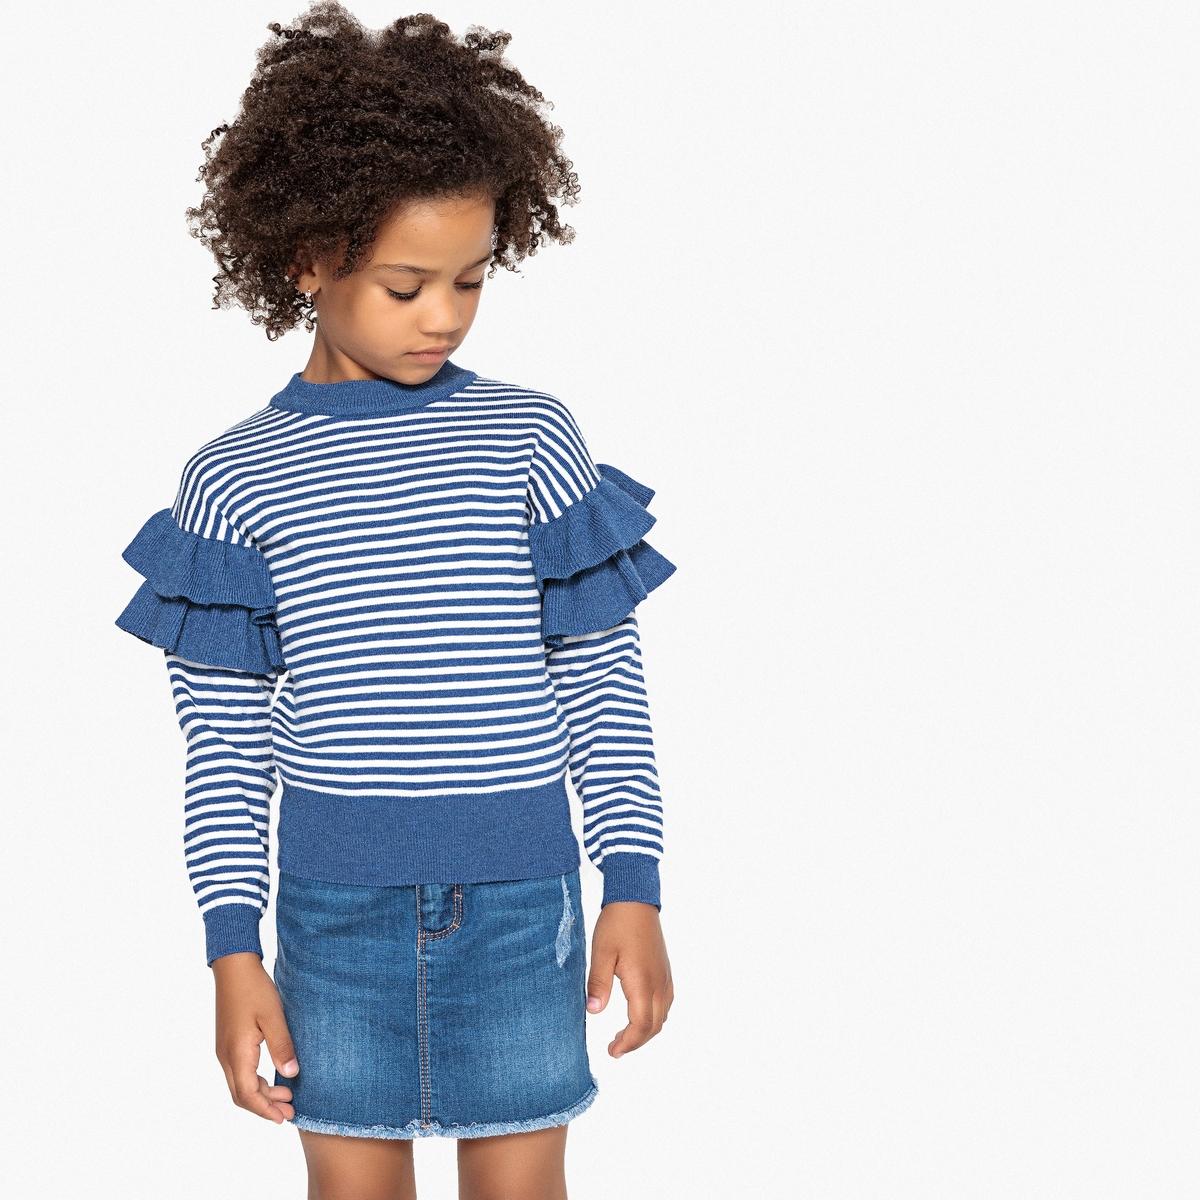 Пуловер La Redoute Из тонкого трикотажа с воланами 12 лет -150 см синий цена